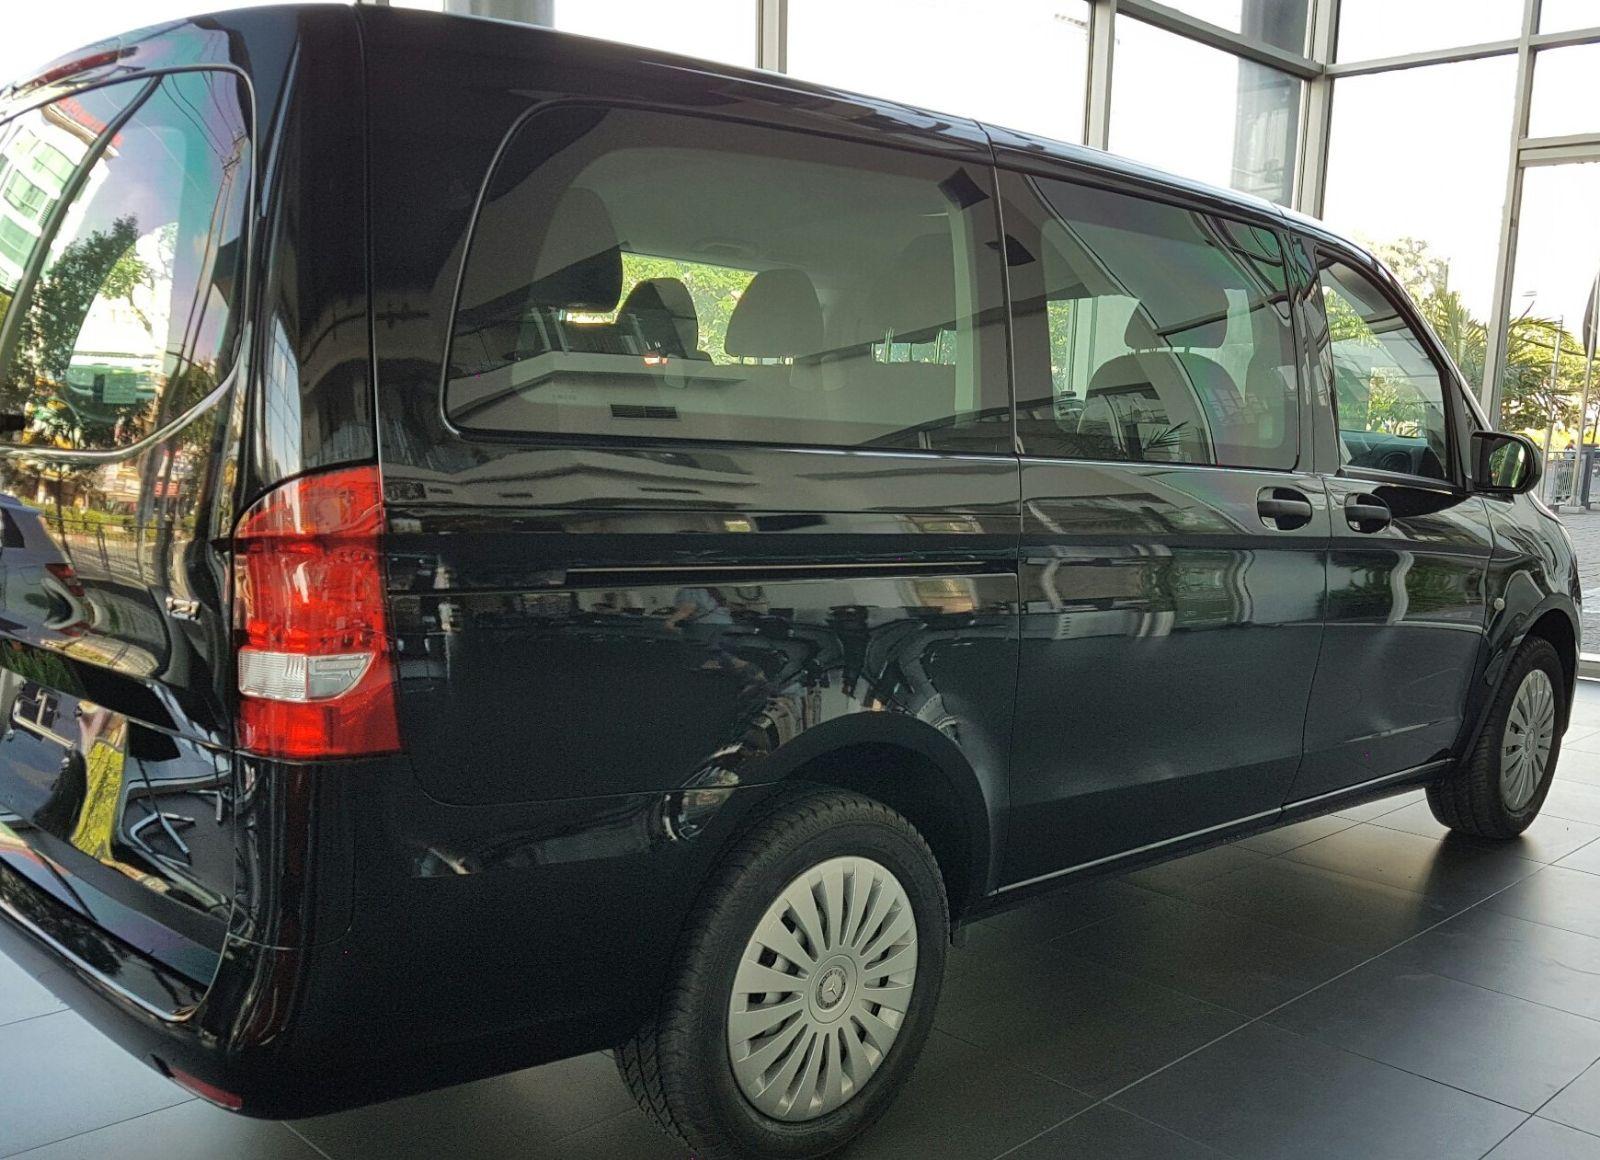 Ngoại thất Xe Mercedes Benz Vito Tourer 121 Máy Xăng màu đen 04